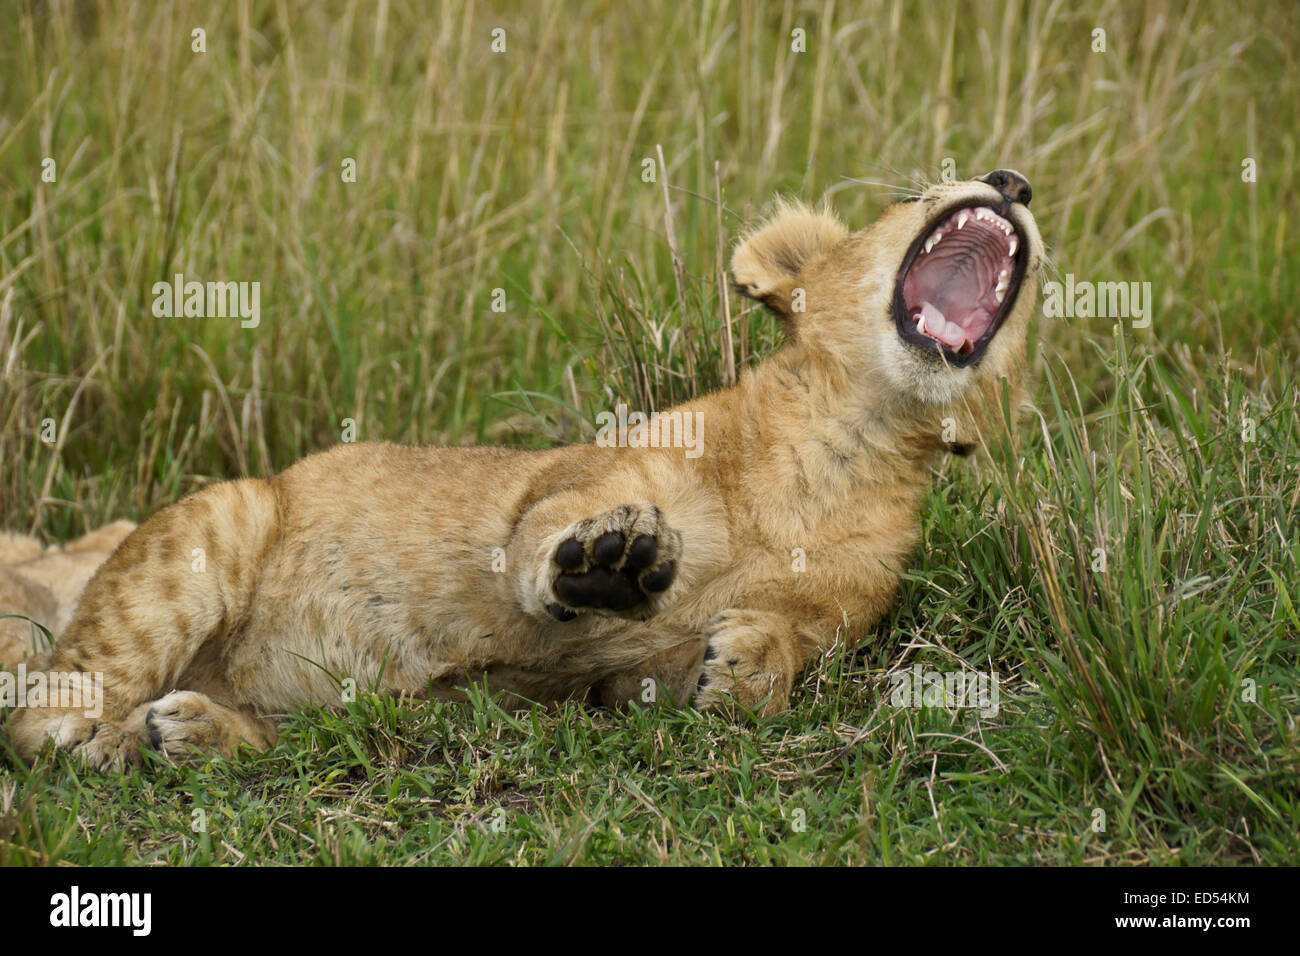 Lion cub yawning, Masai Mara, Kenya - Stock Image